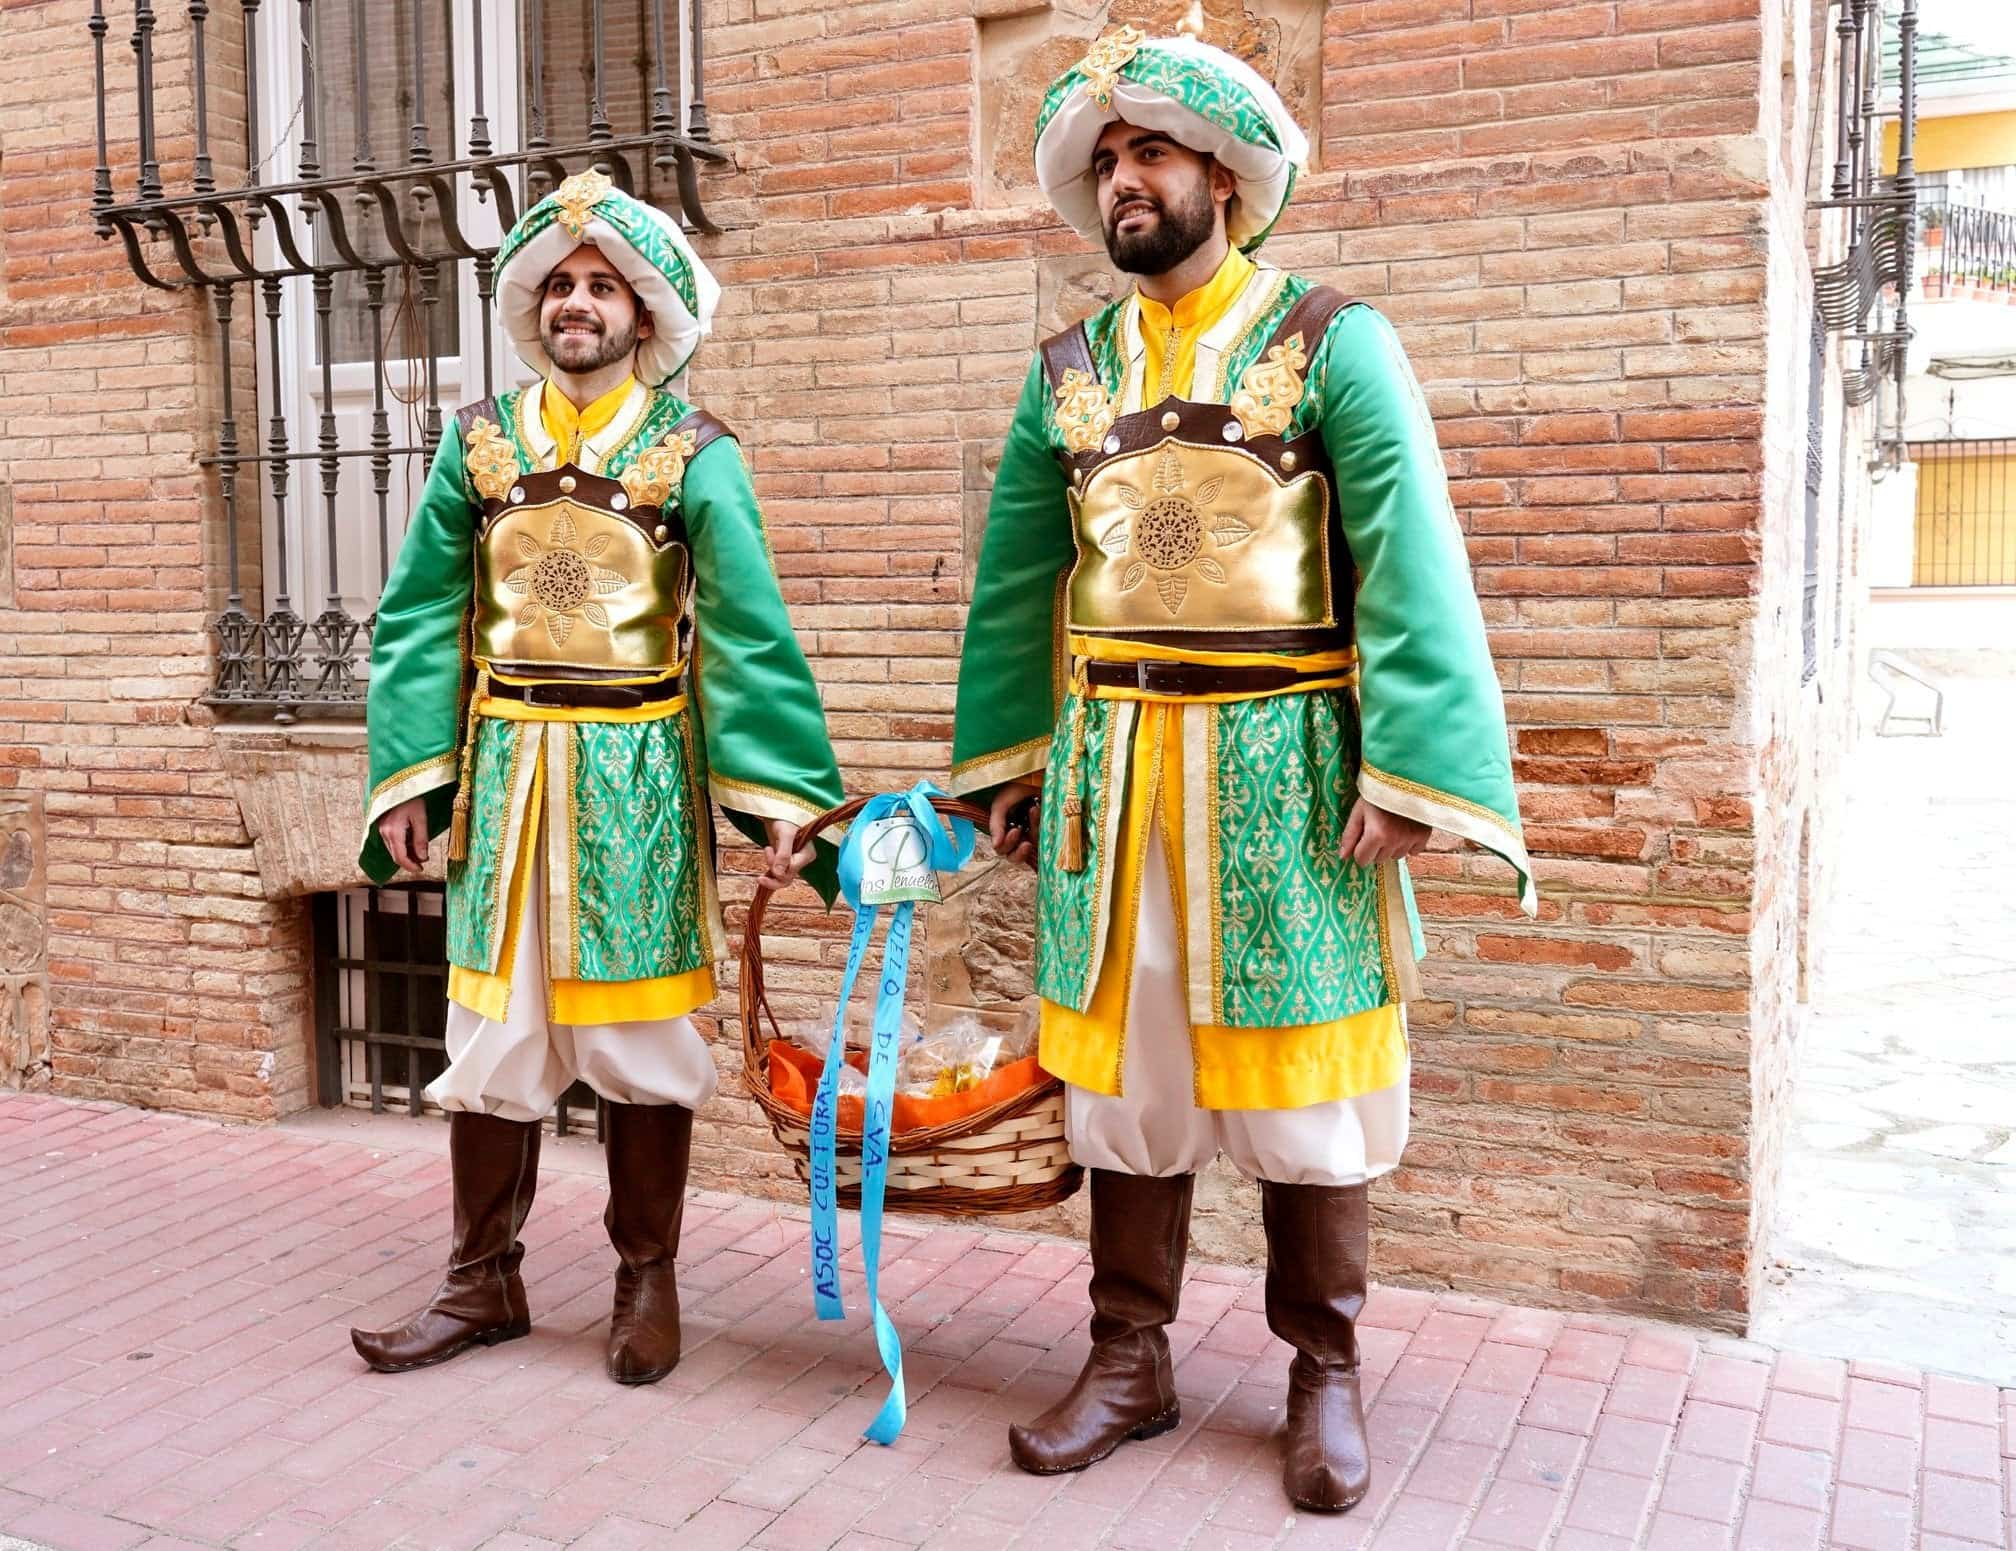 Carnaval de herencia 2020 ofertorio 166 - Selección de fotografías del Ofertorio del Carnaval de Herencia